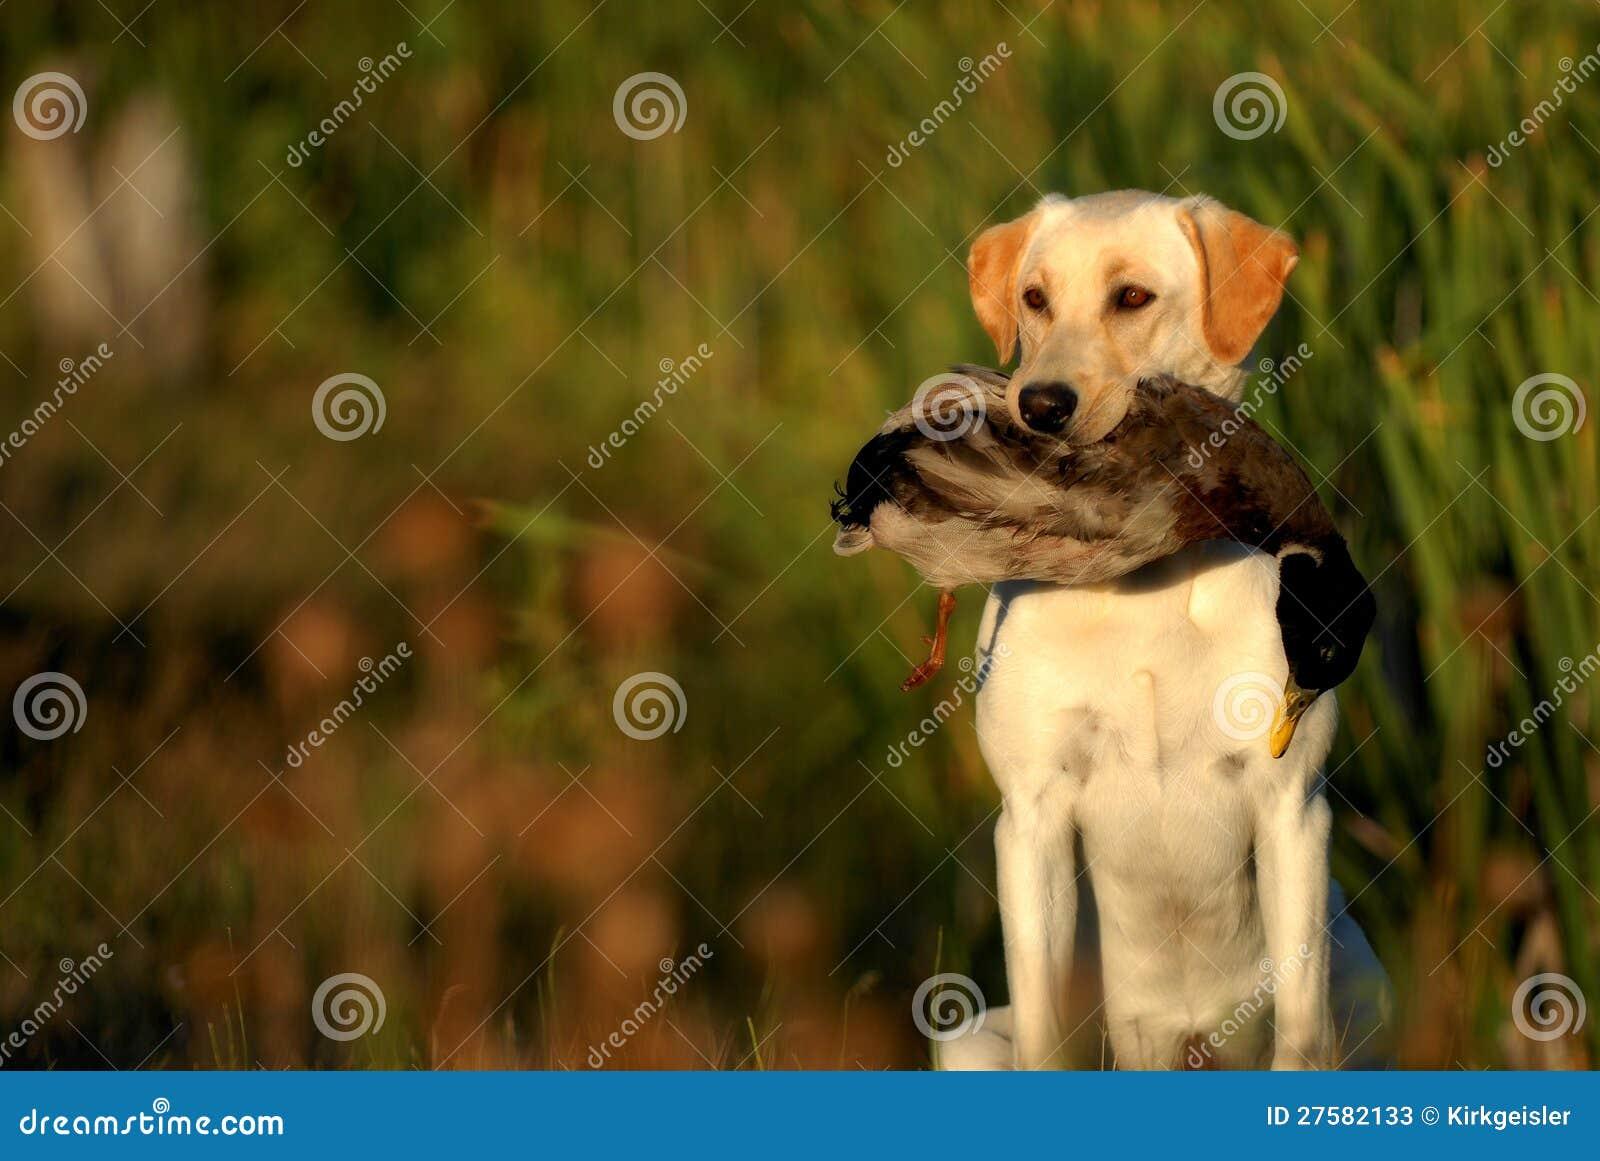 Hunting Yellow Labrador dog